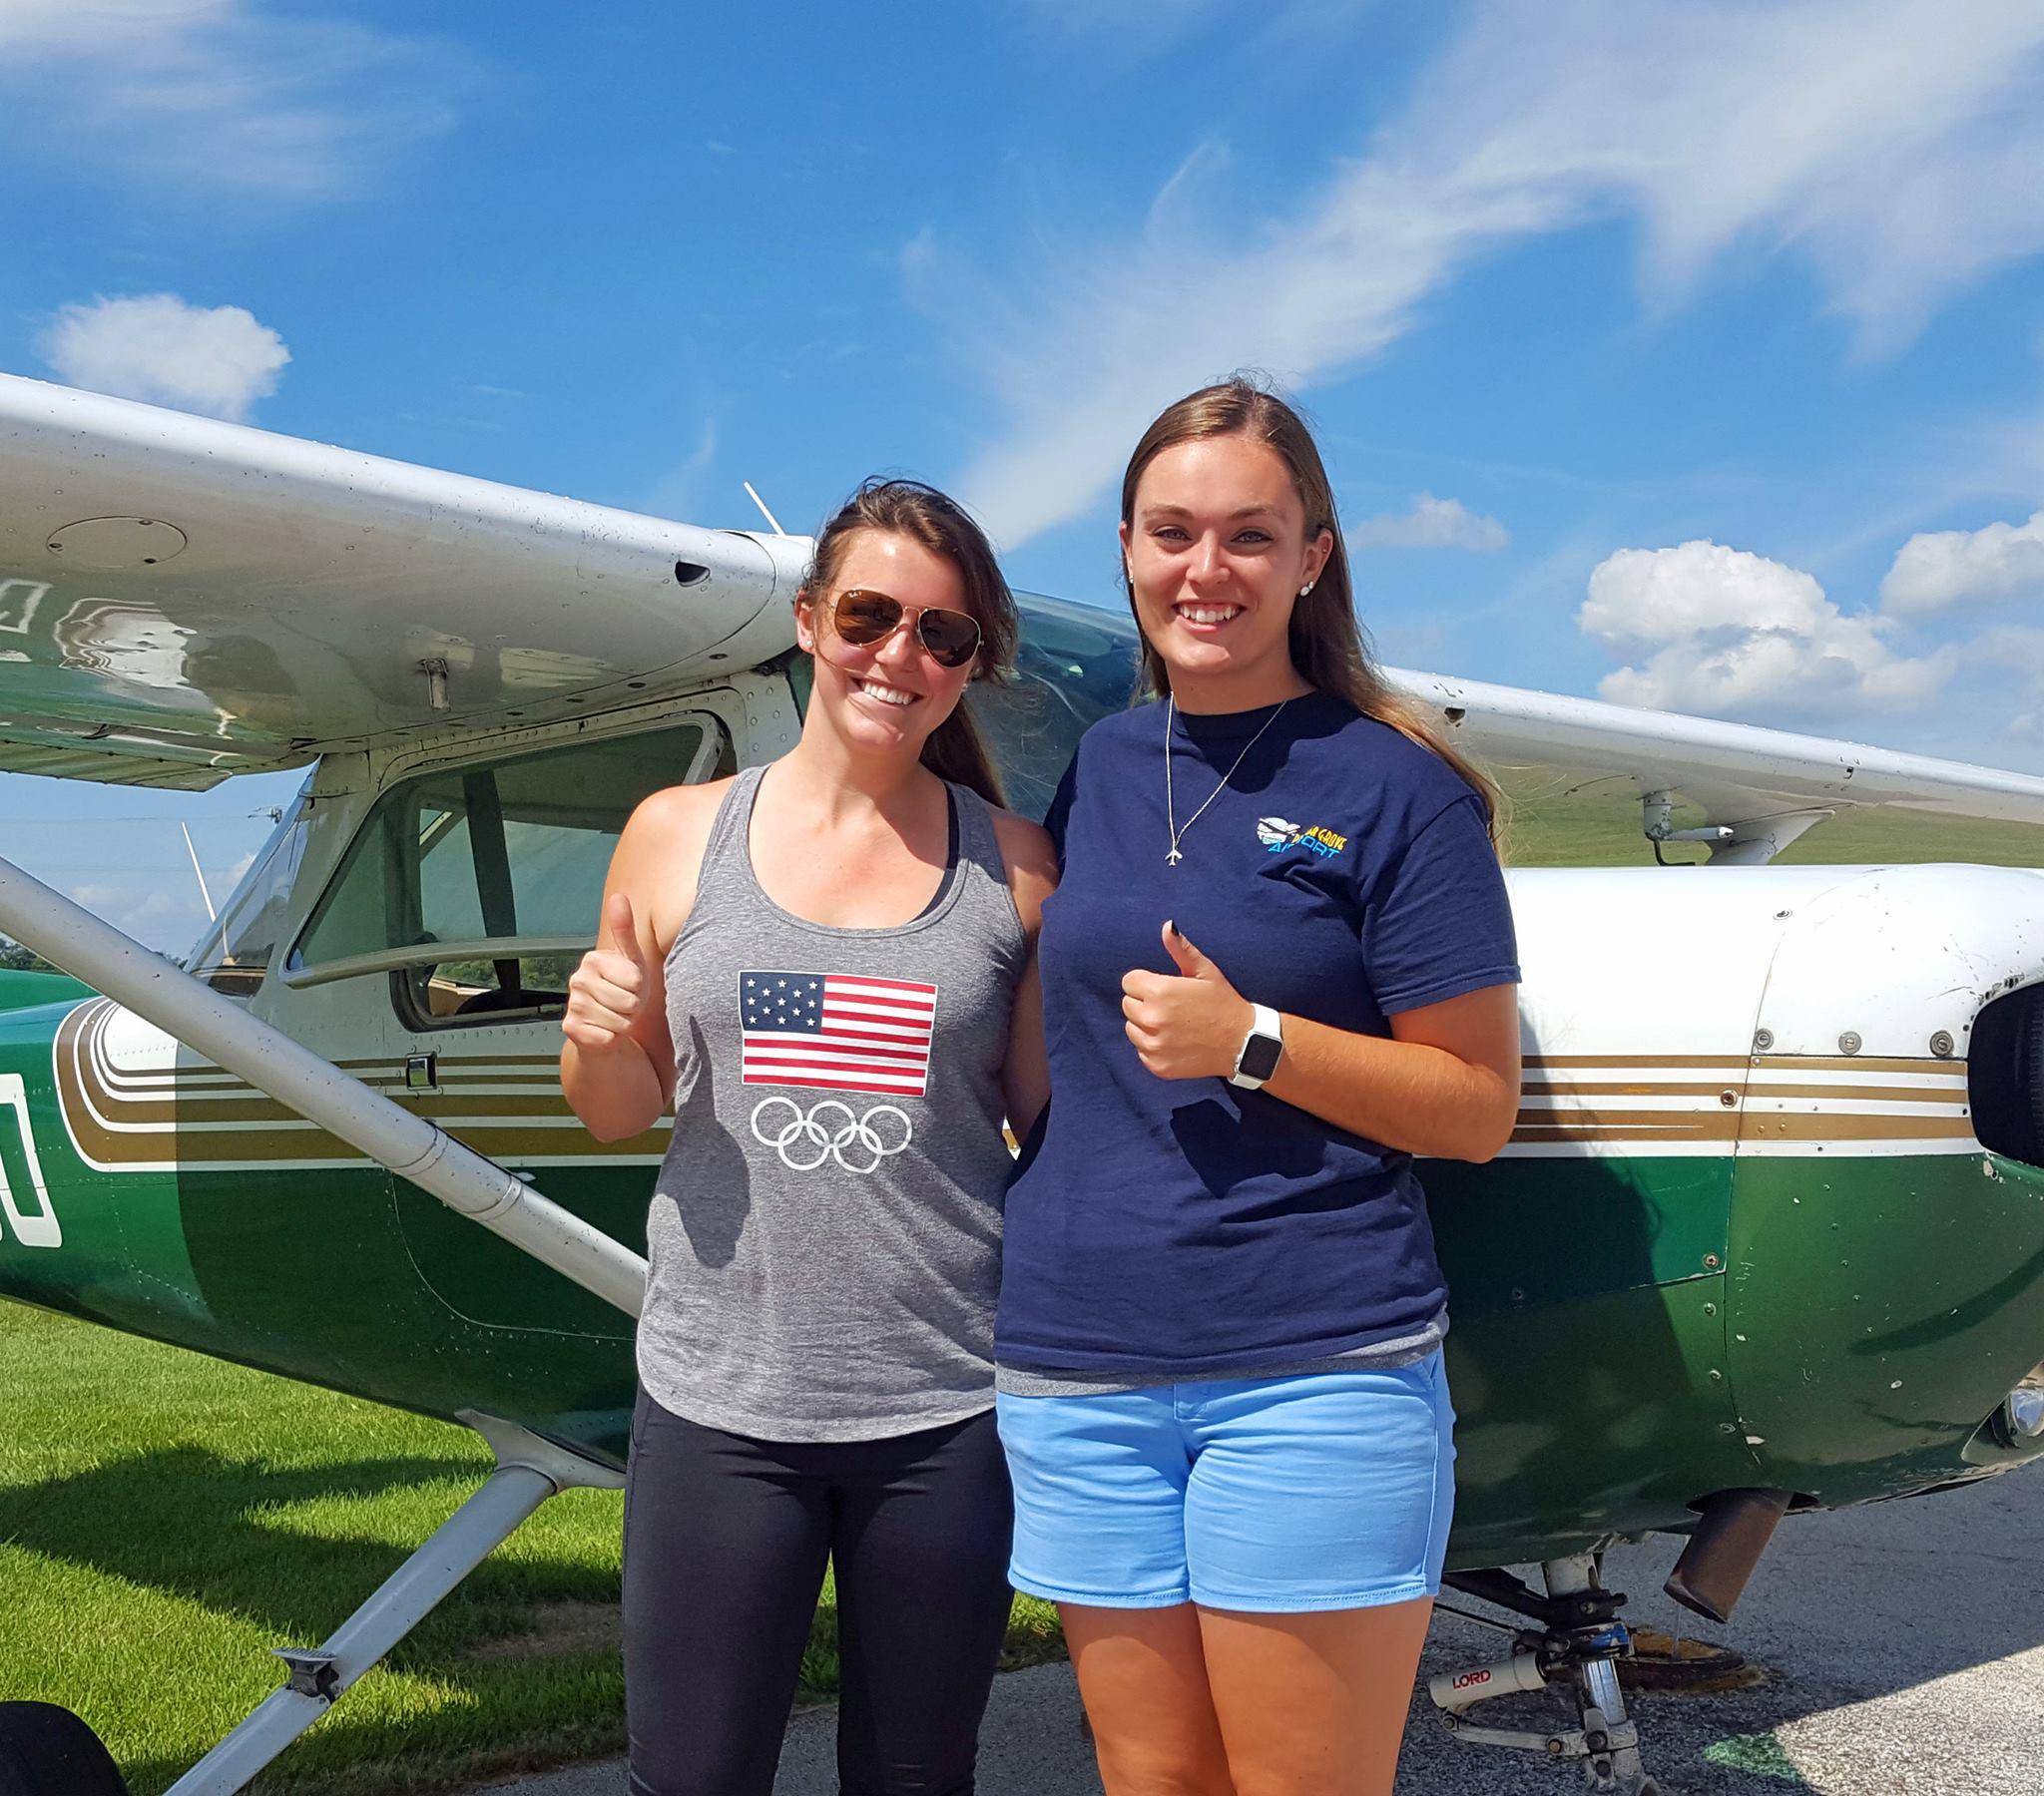 amber-eck-poplar-grove-airport-pilot-flight-lessons